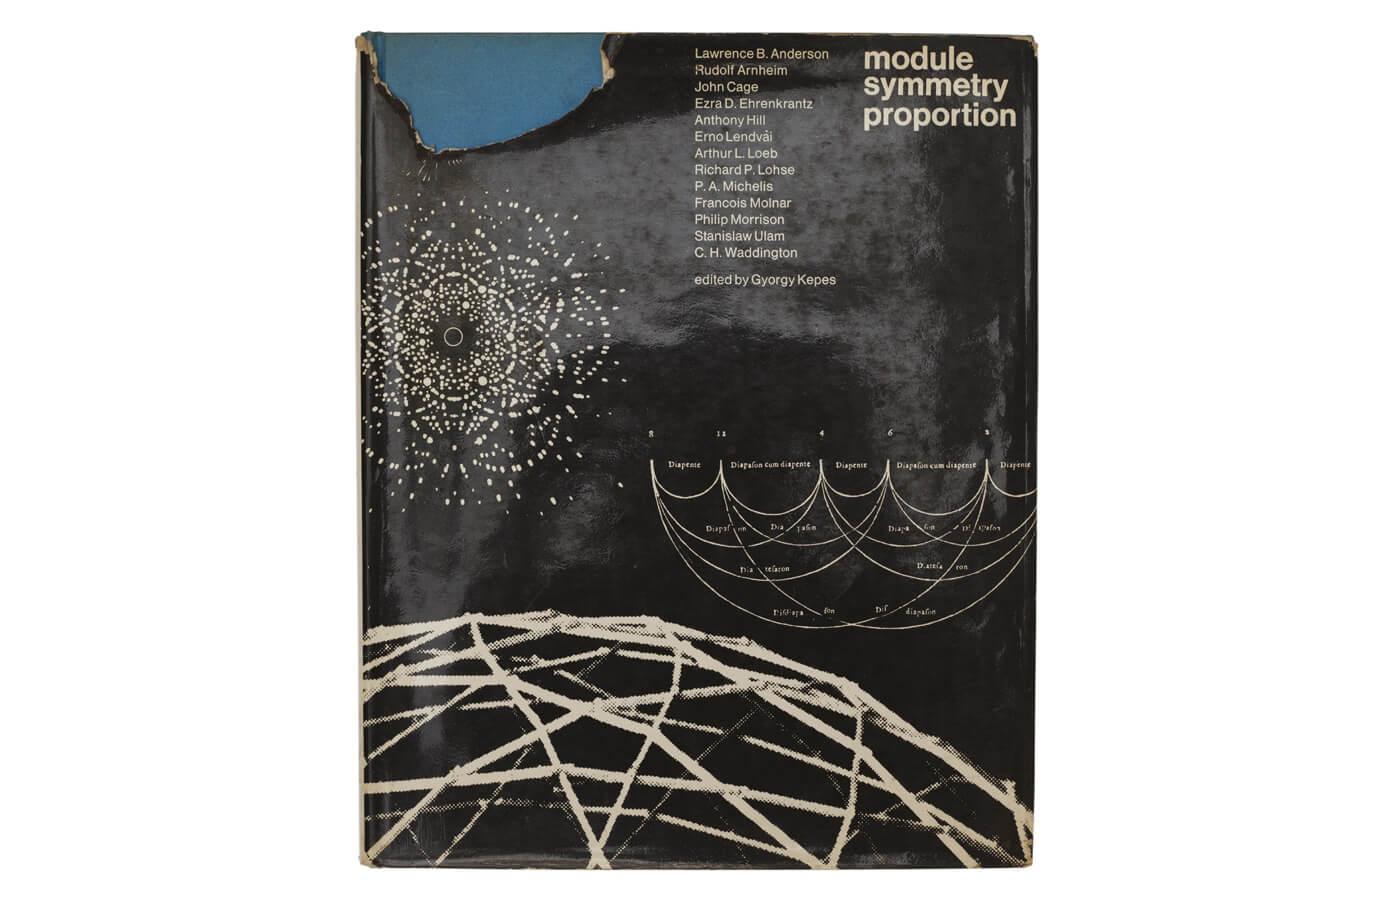 Module, Symmetry, Proportion